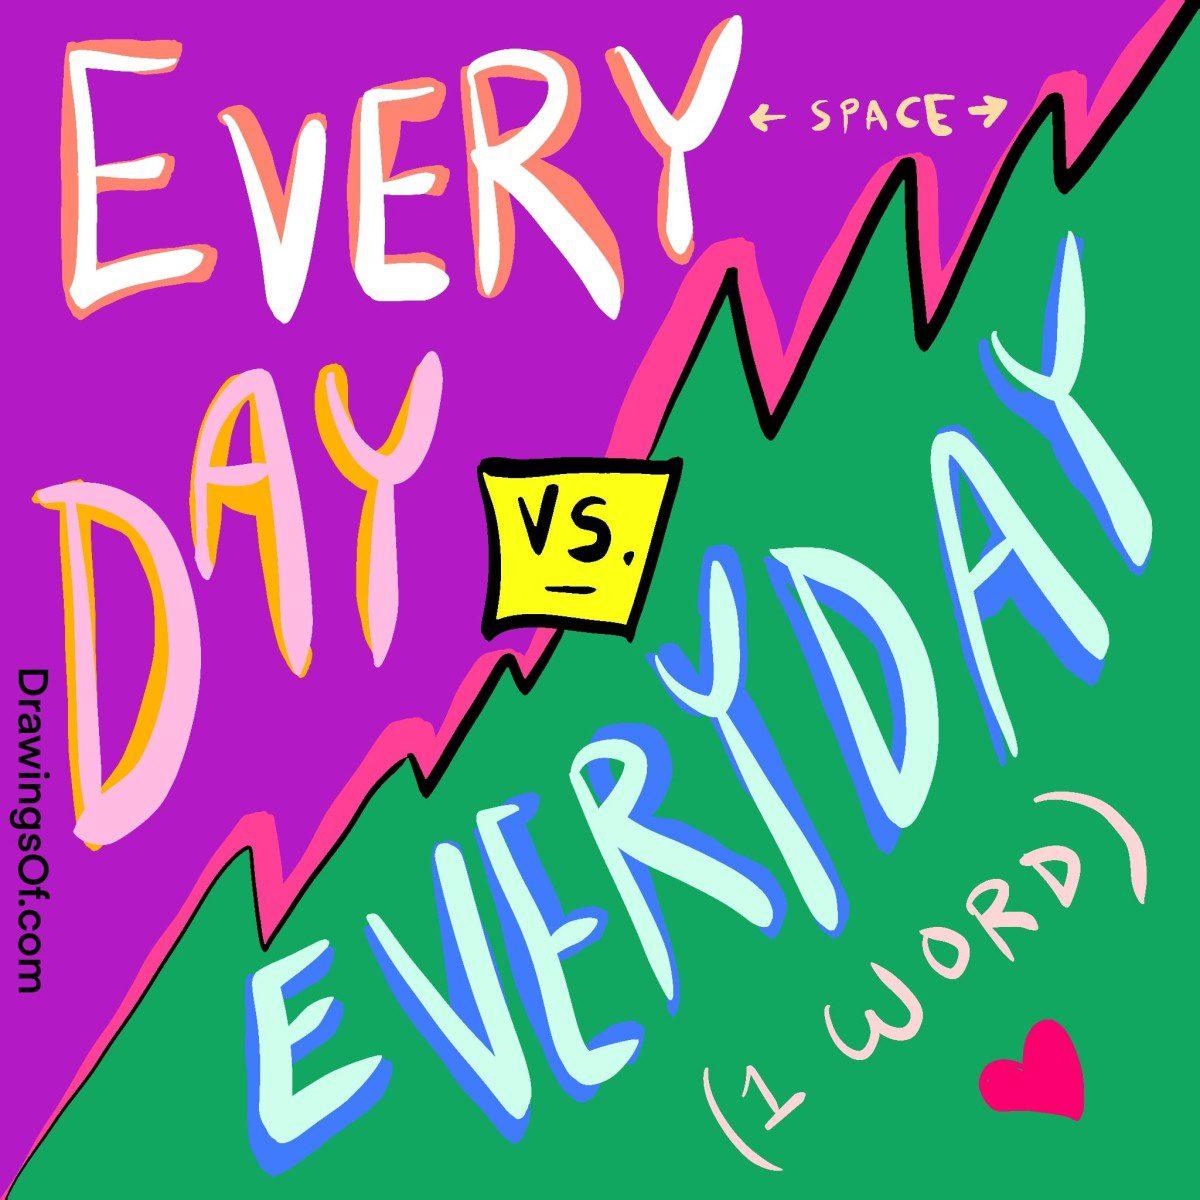 Everyday vs. Every Day